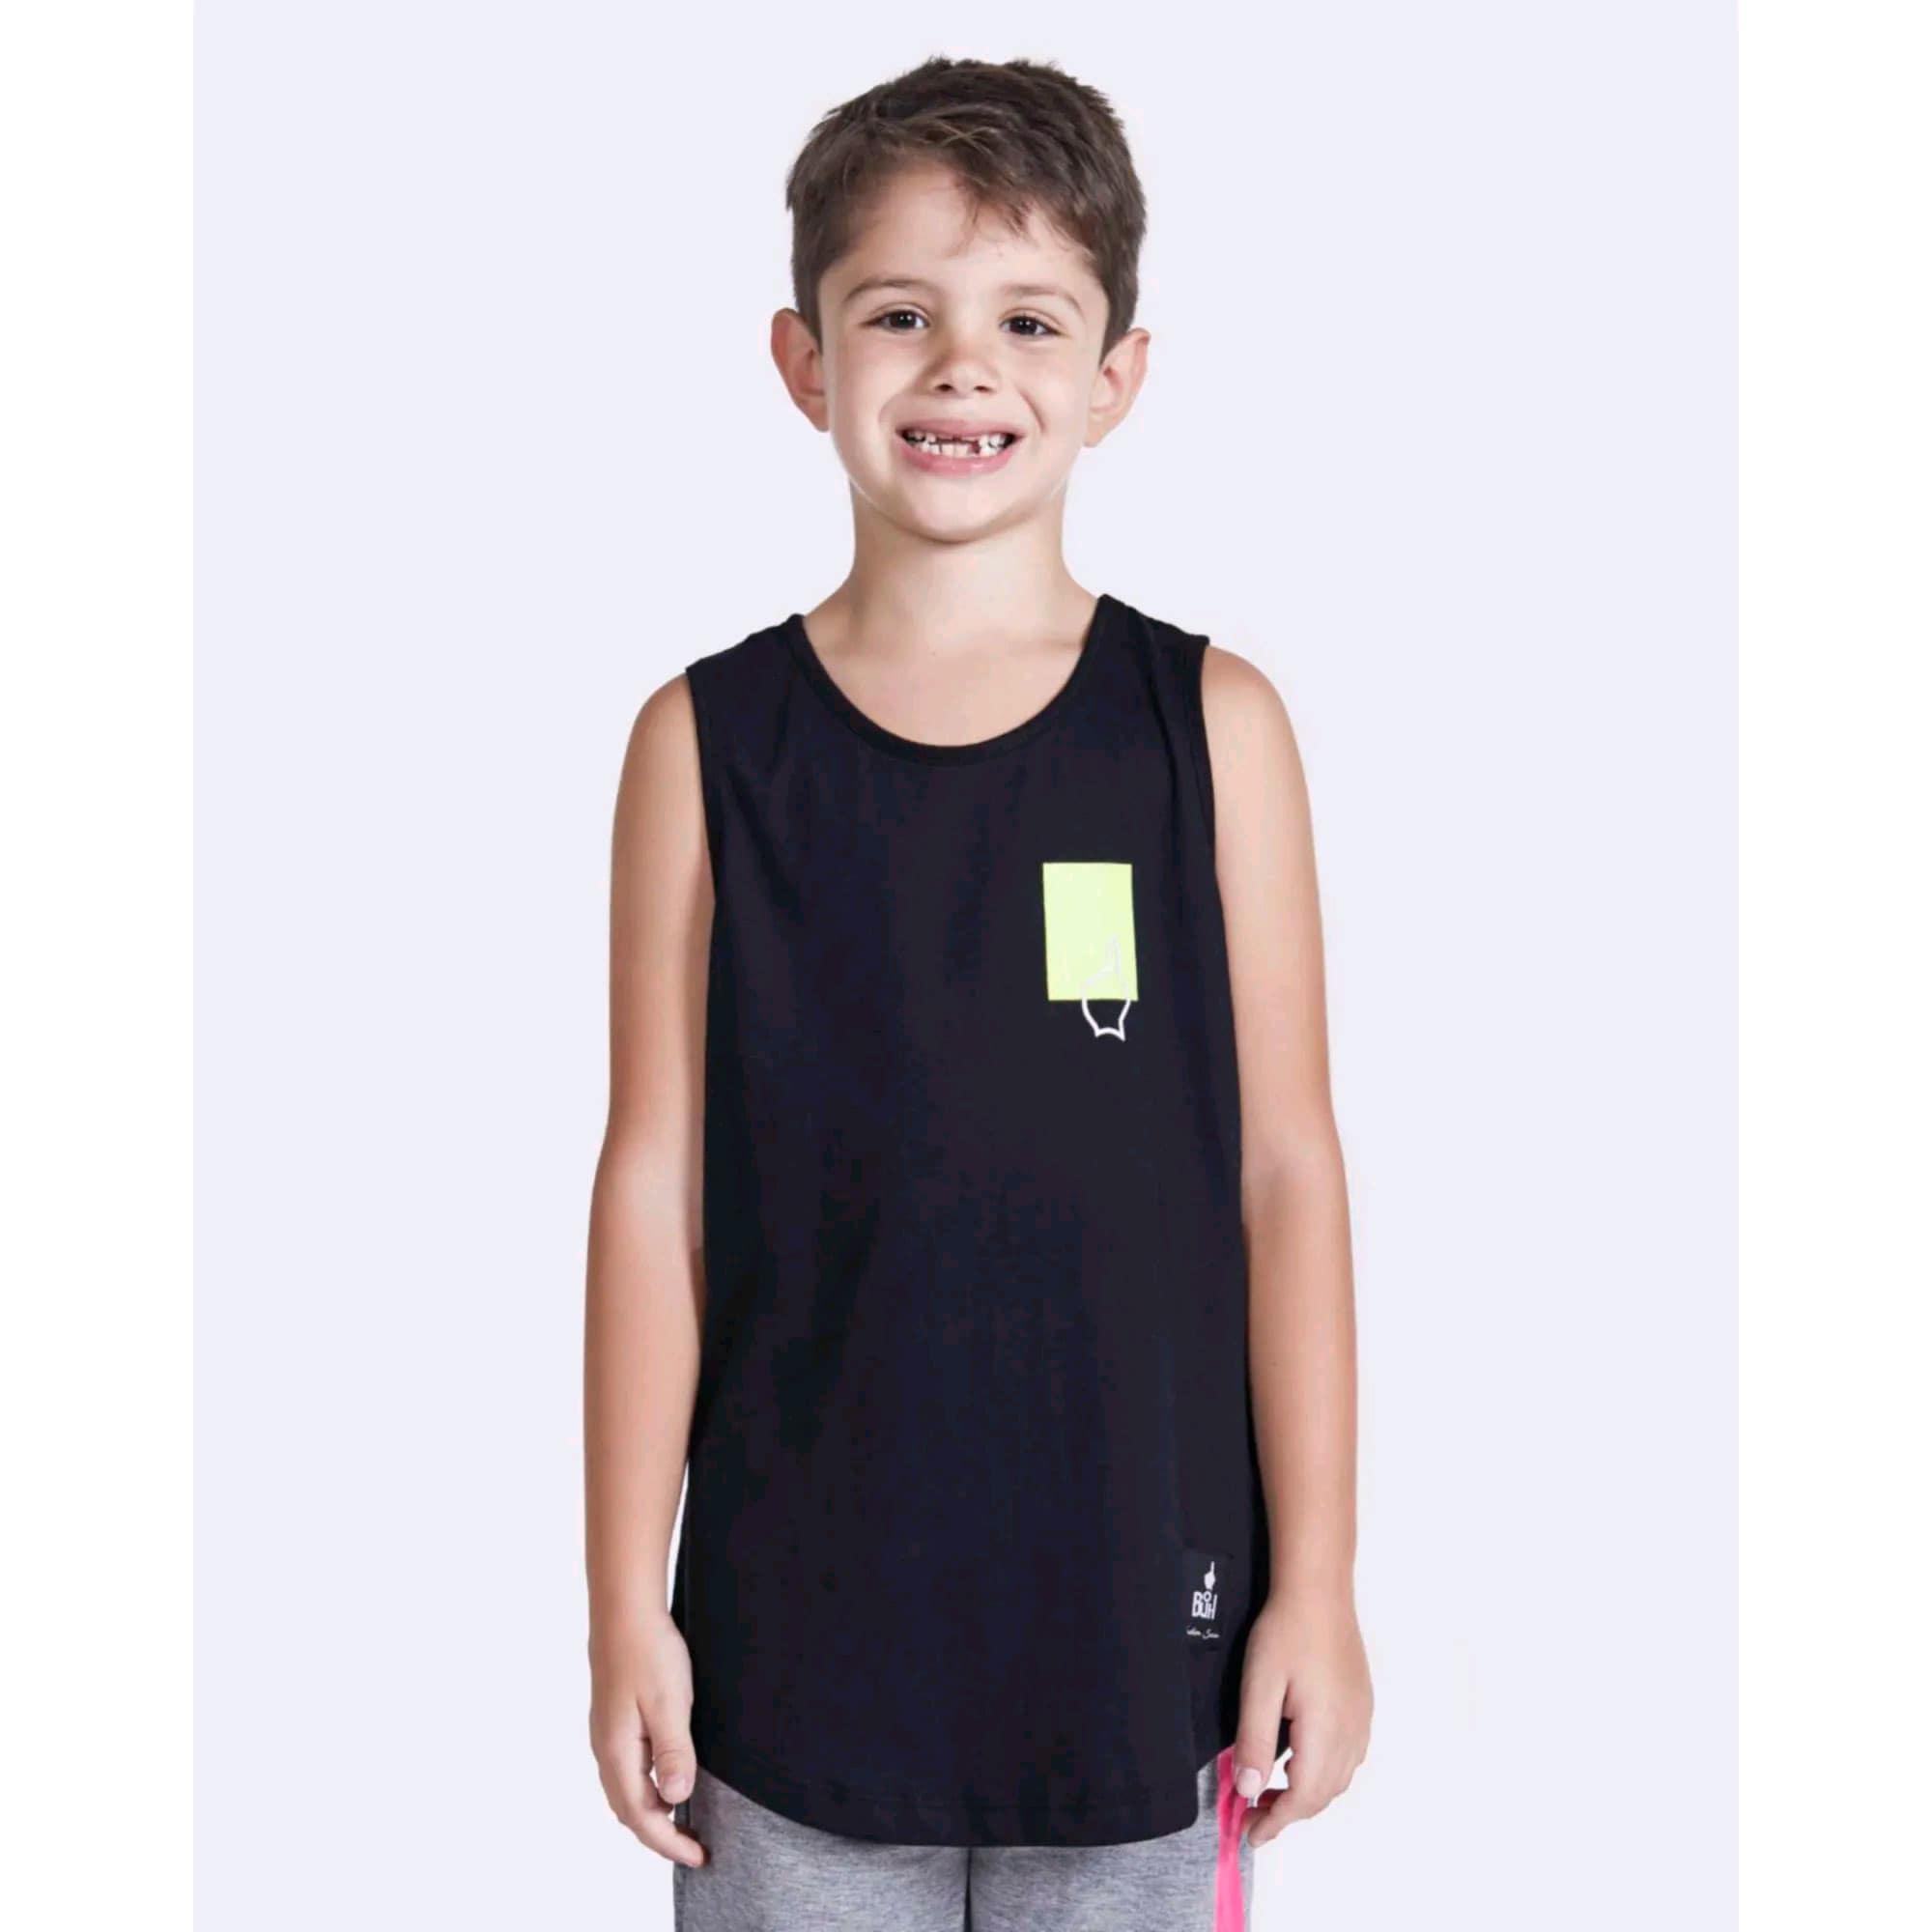 Regata Buh Kids Square Black & Neon